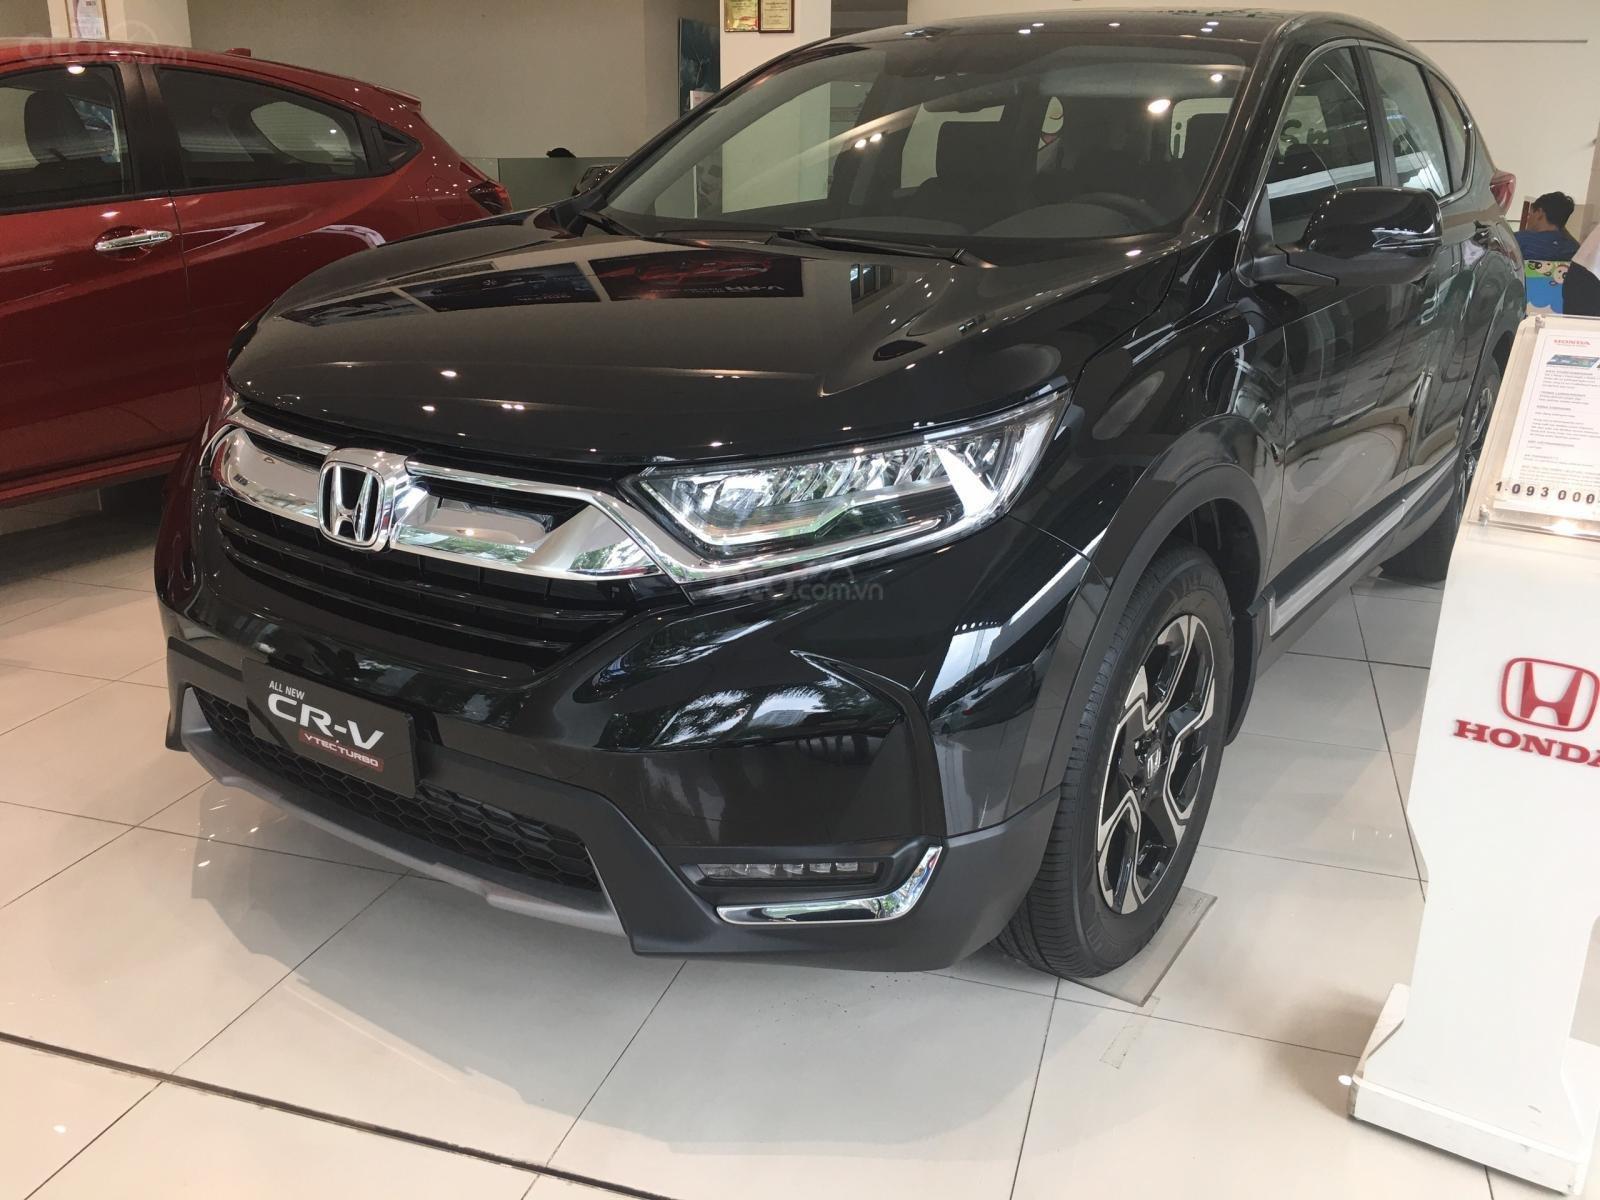 Honda CRV E 2019  + tặng 50 triệu tiền mặt - LH: 0966877768 Mr Hải (2)